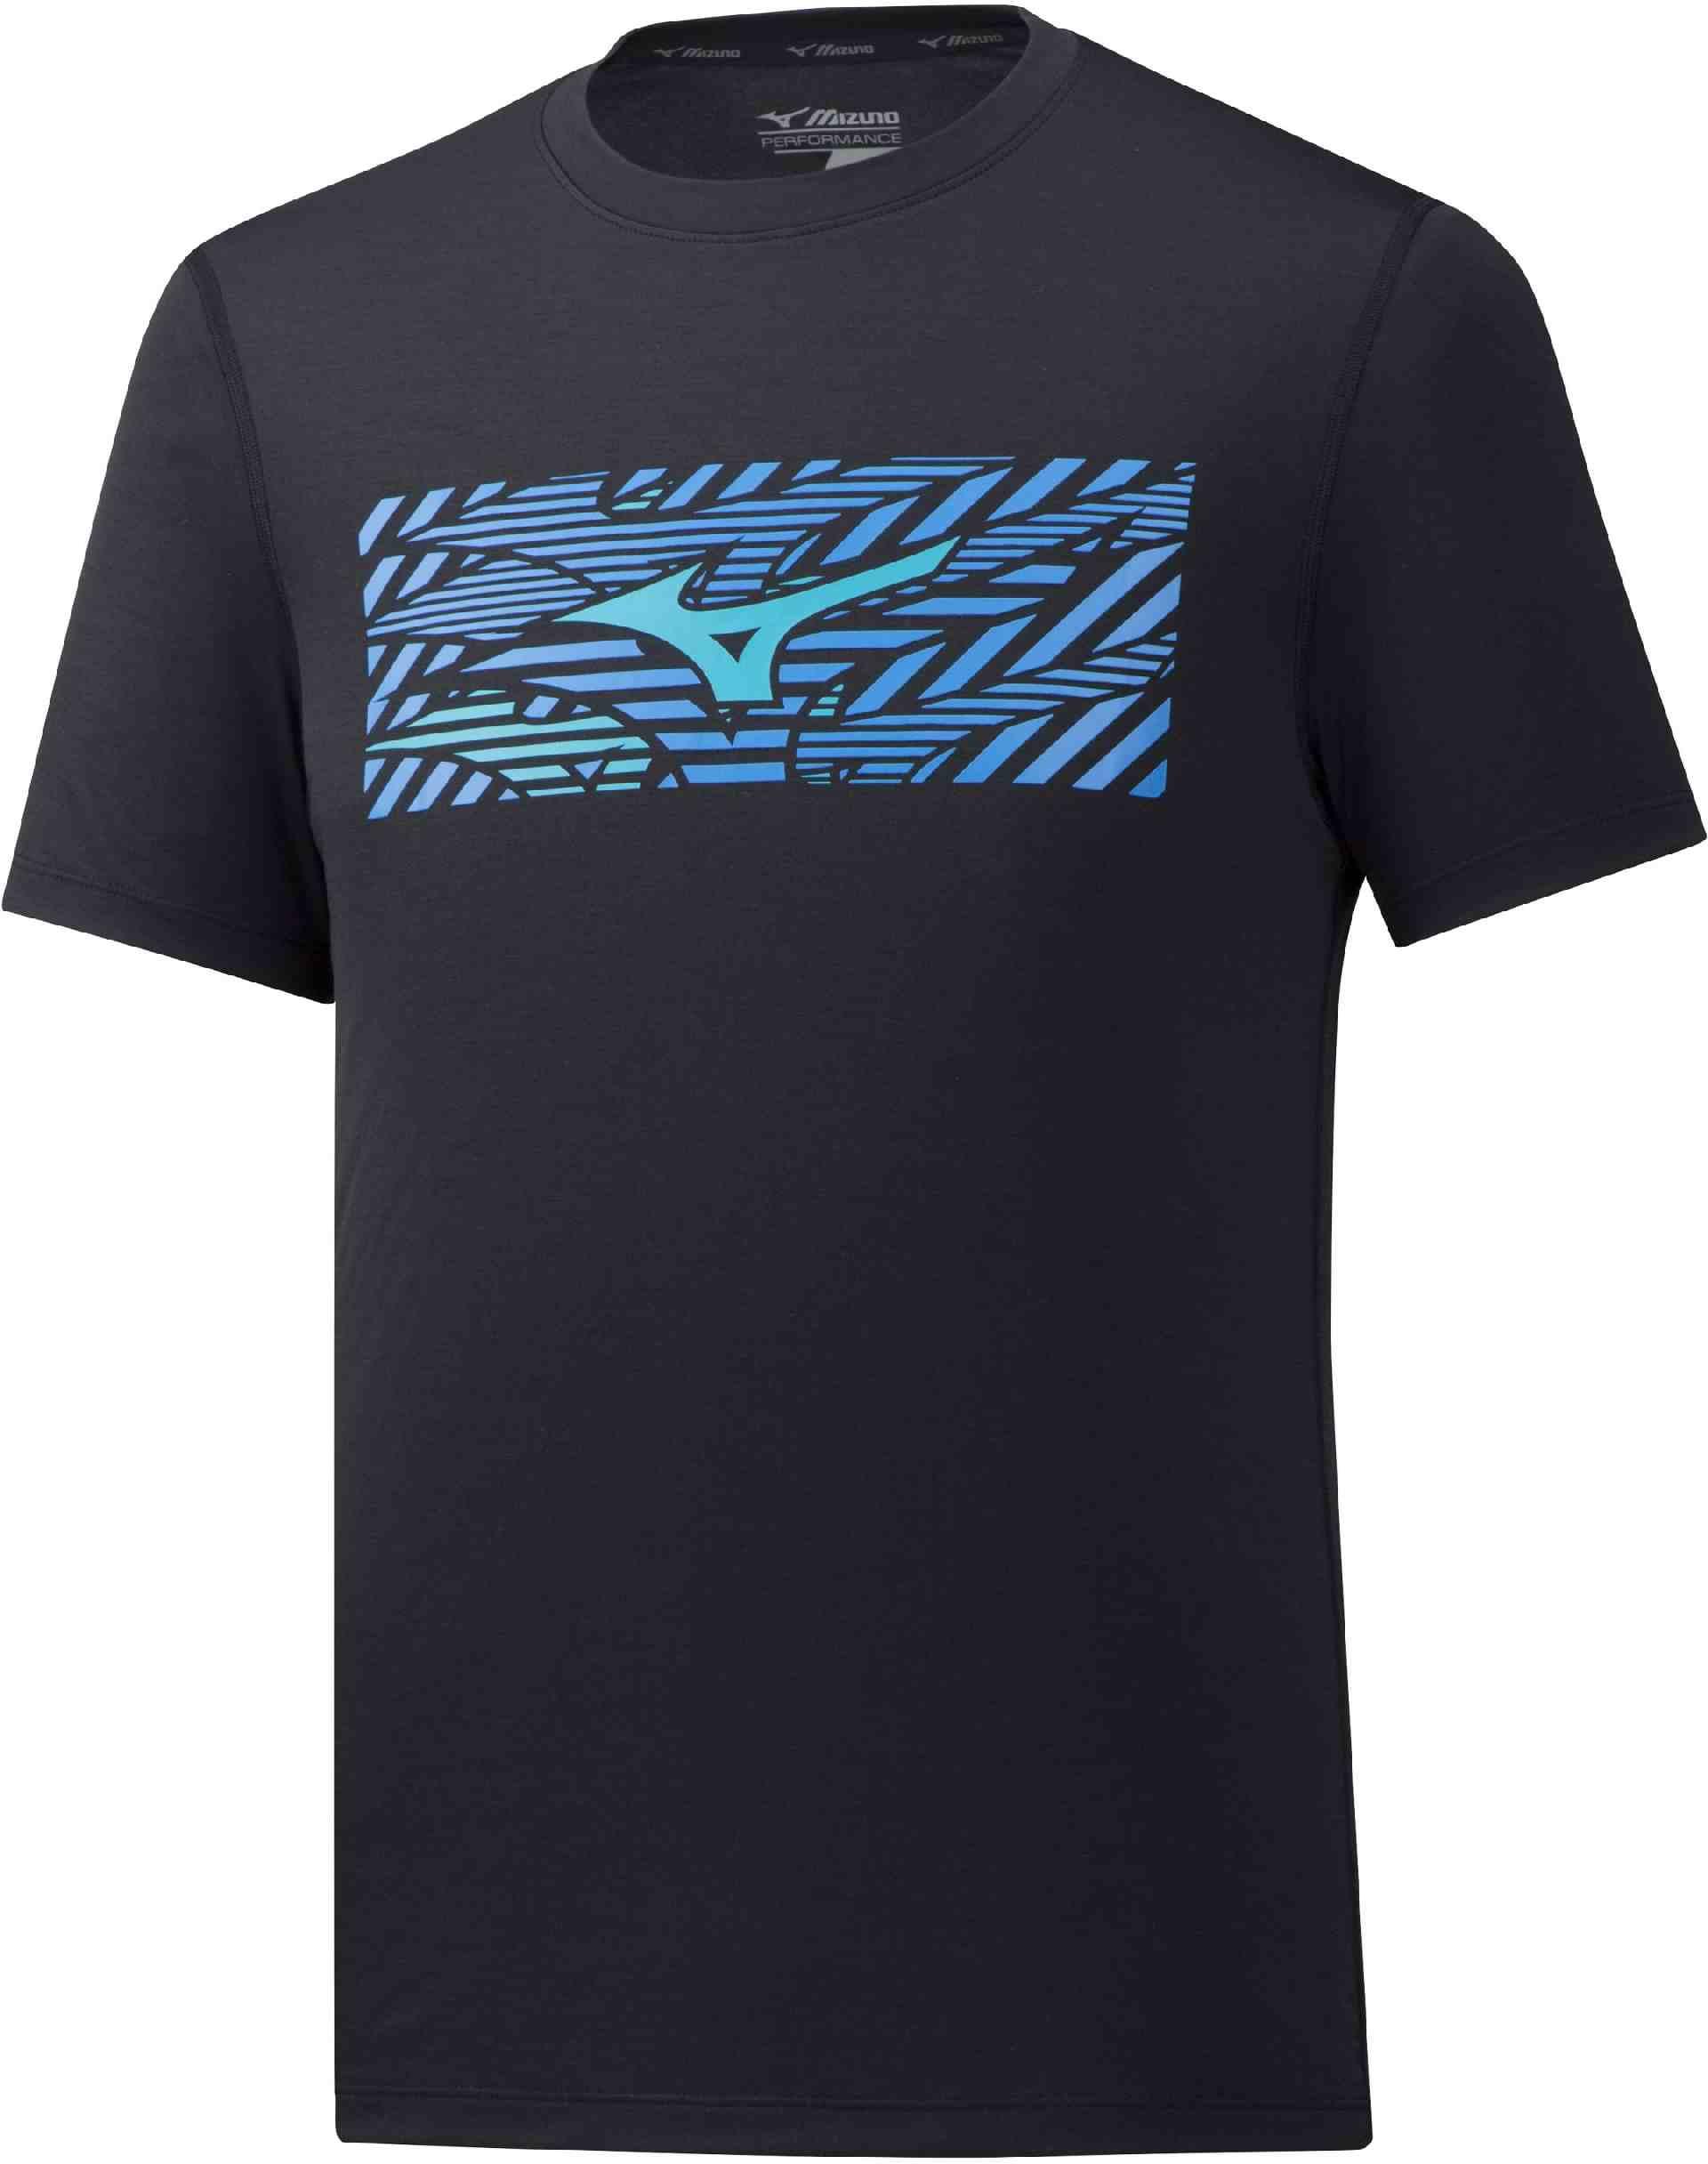 91911394d Mizuno IMPULSE CORE WILD BIRD TEE. Pánské běžecké triko